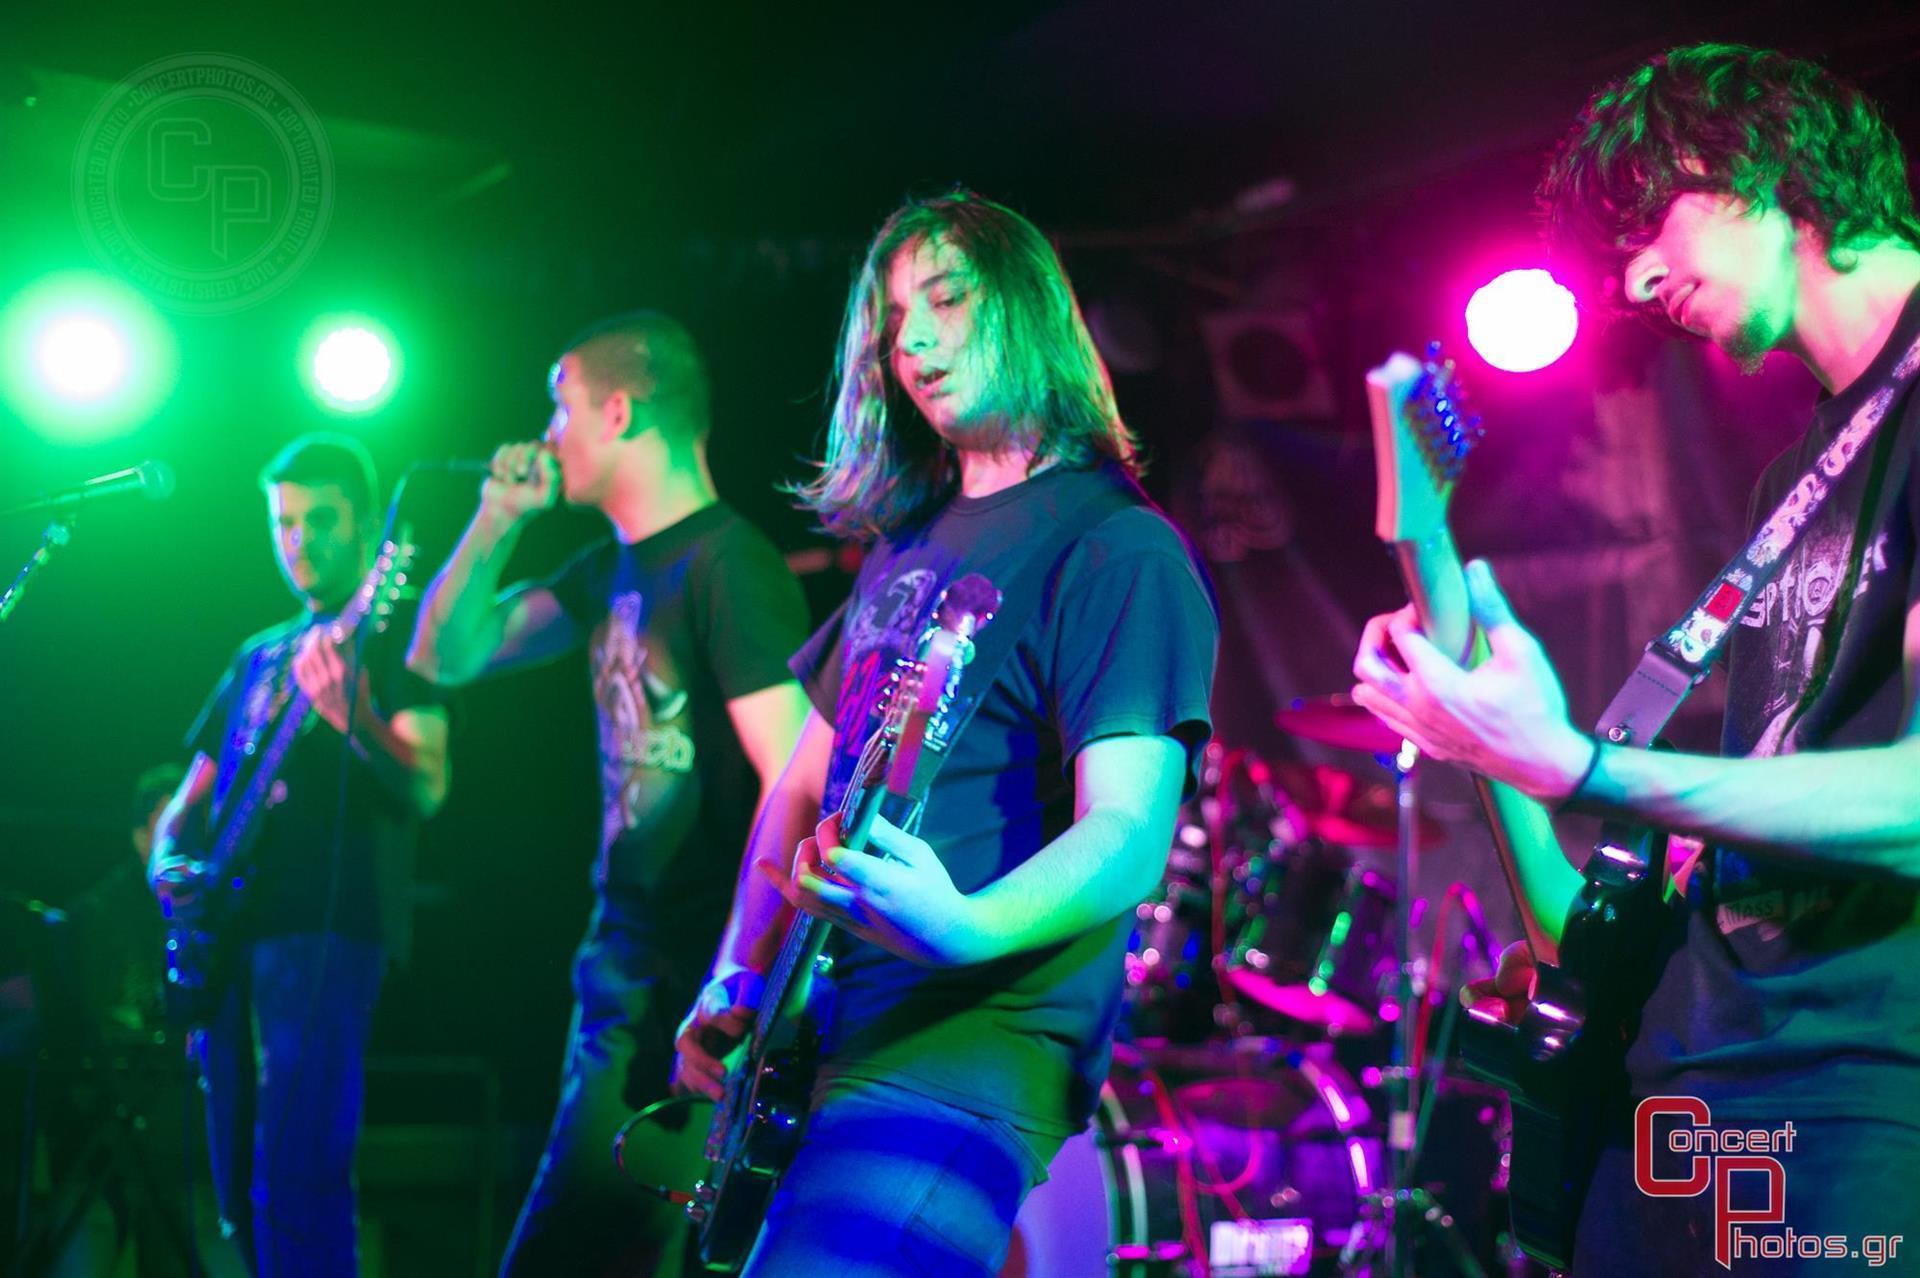 Battle Of The Bands Athens - Leg 3- photographer:  - ConcertPhotos - 20150104_2101_49